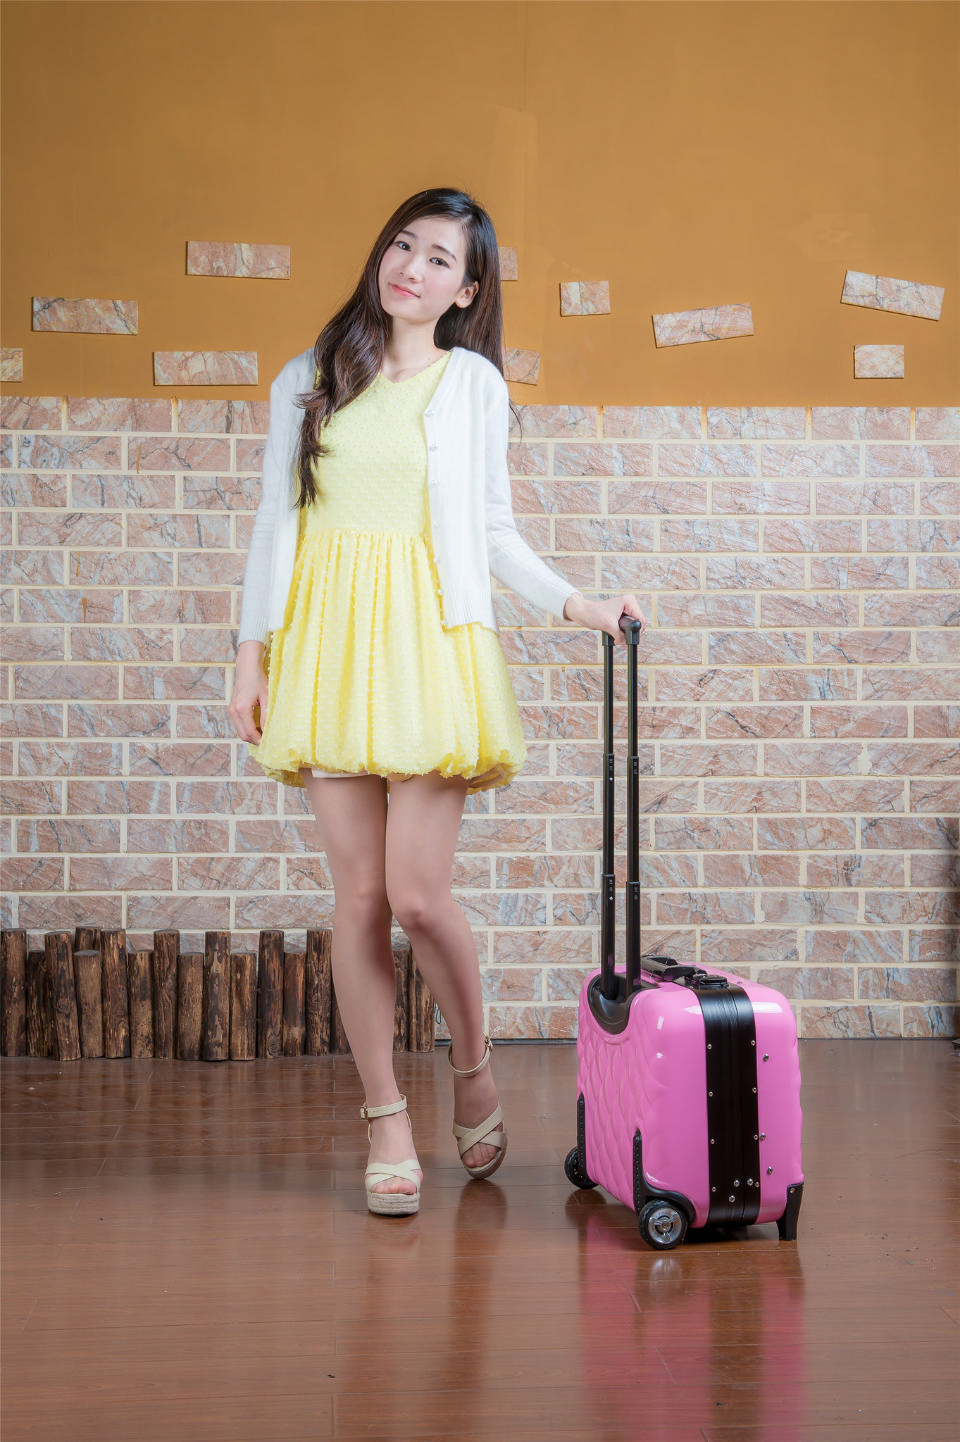 Beautiful Asian Female Model in Yellow Dress